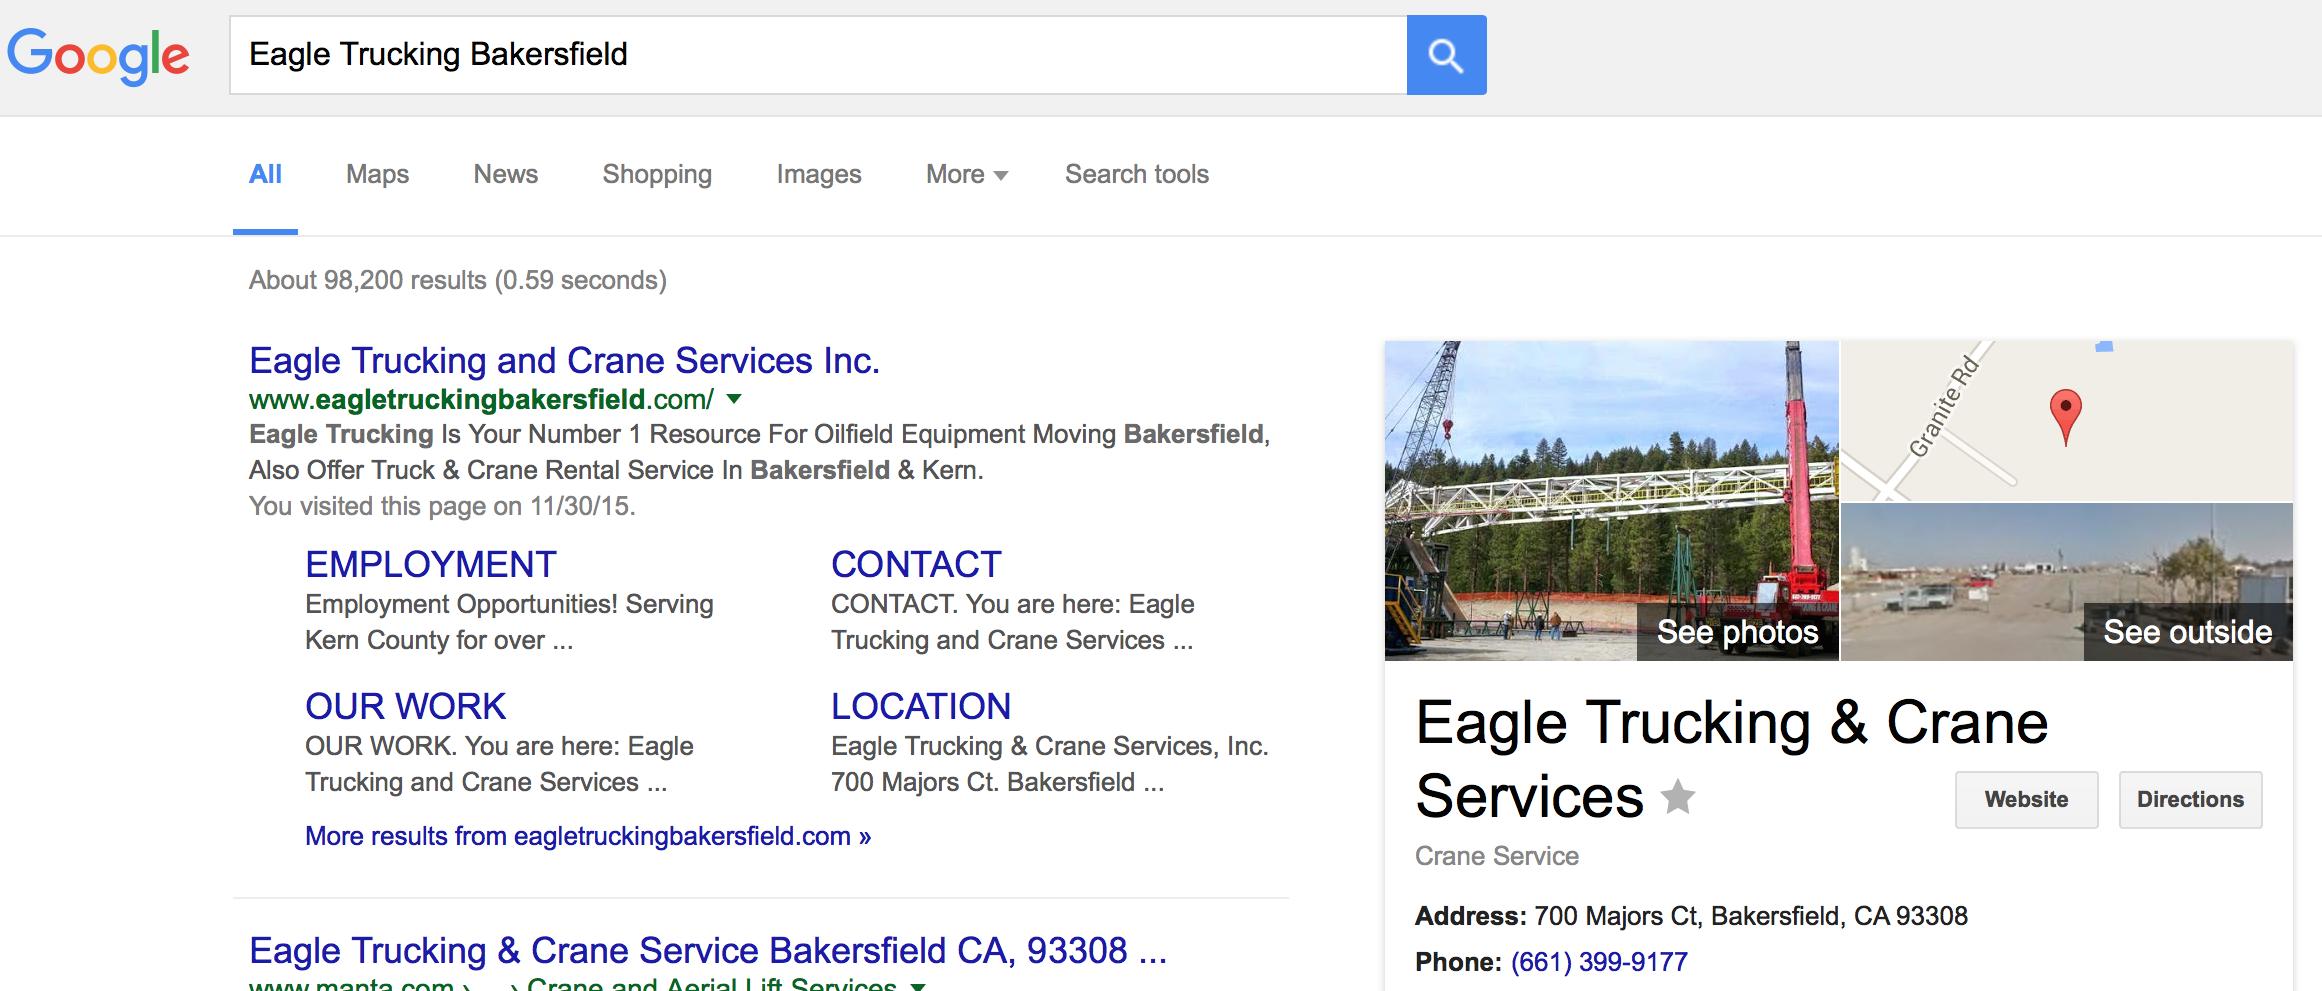 Bakersfield SEO Web Design, SEO Services